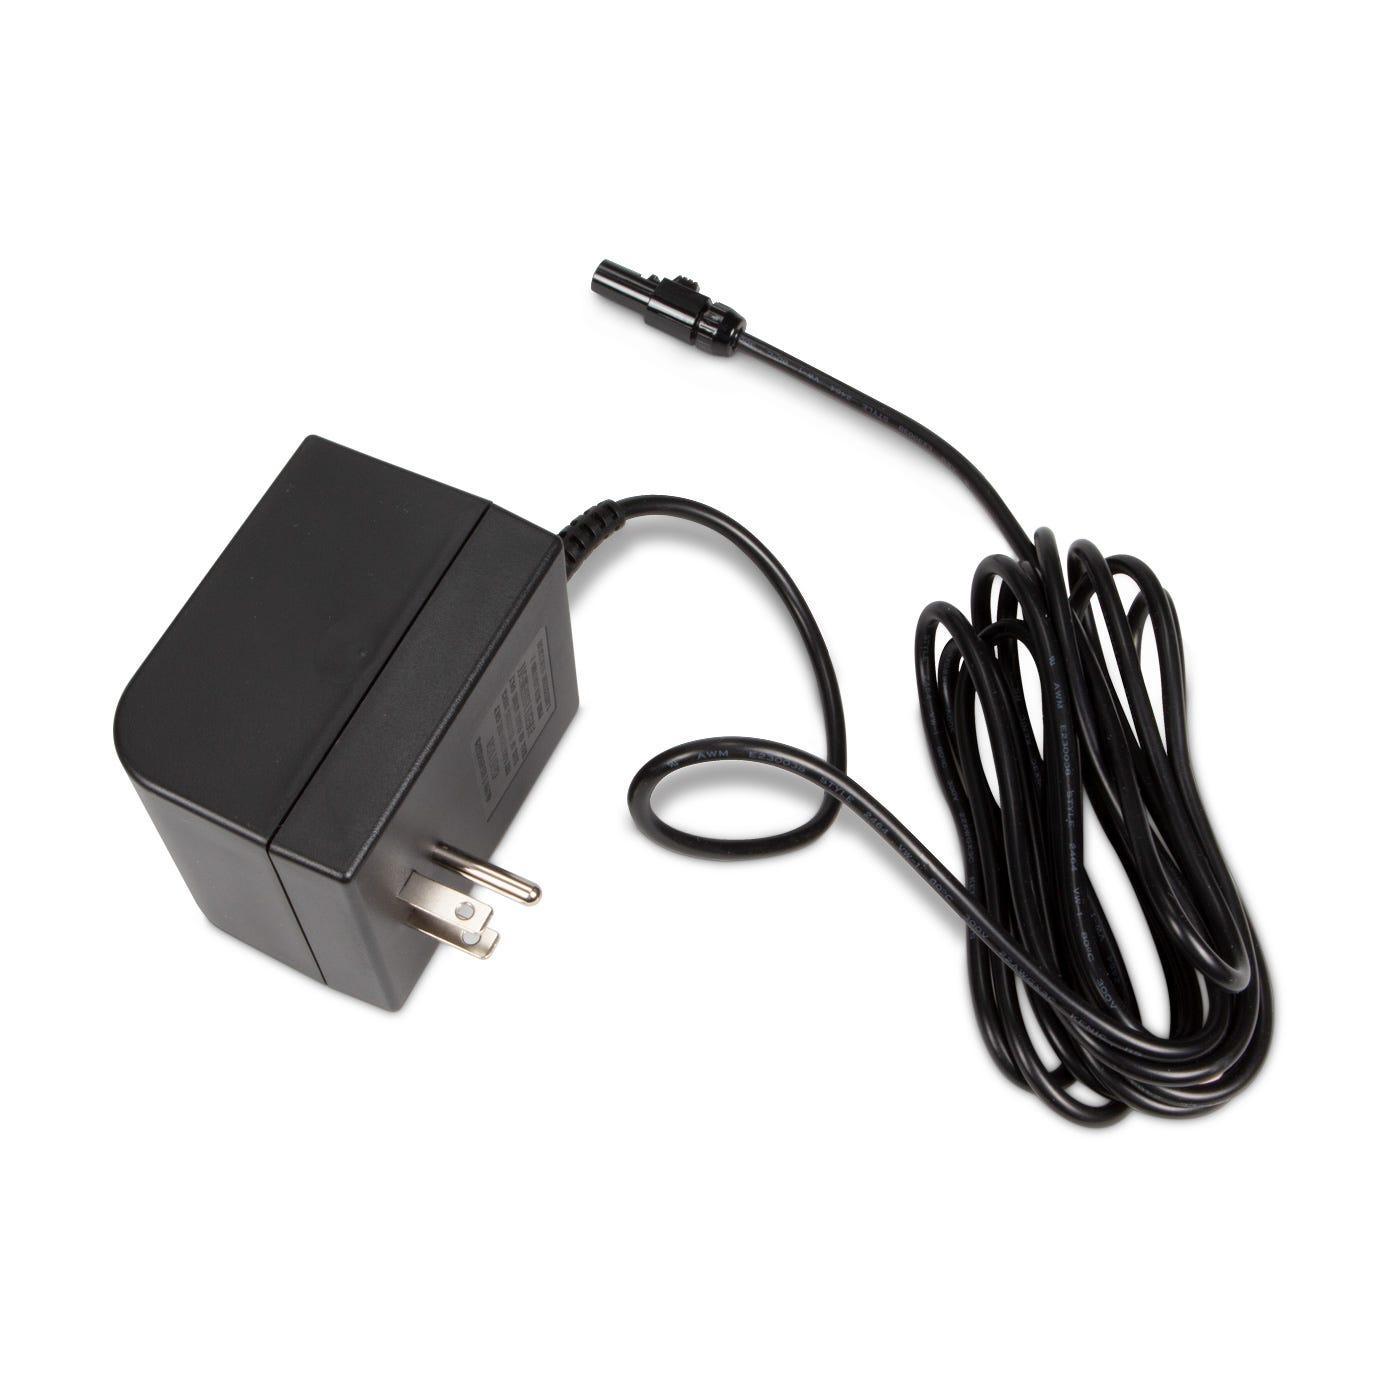 Piezo Ultrasonic Scaler - Pro-Select Platinum Transformer Adapter